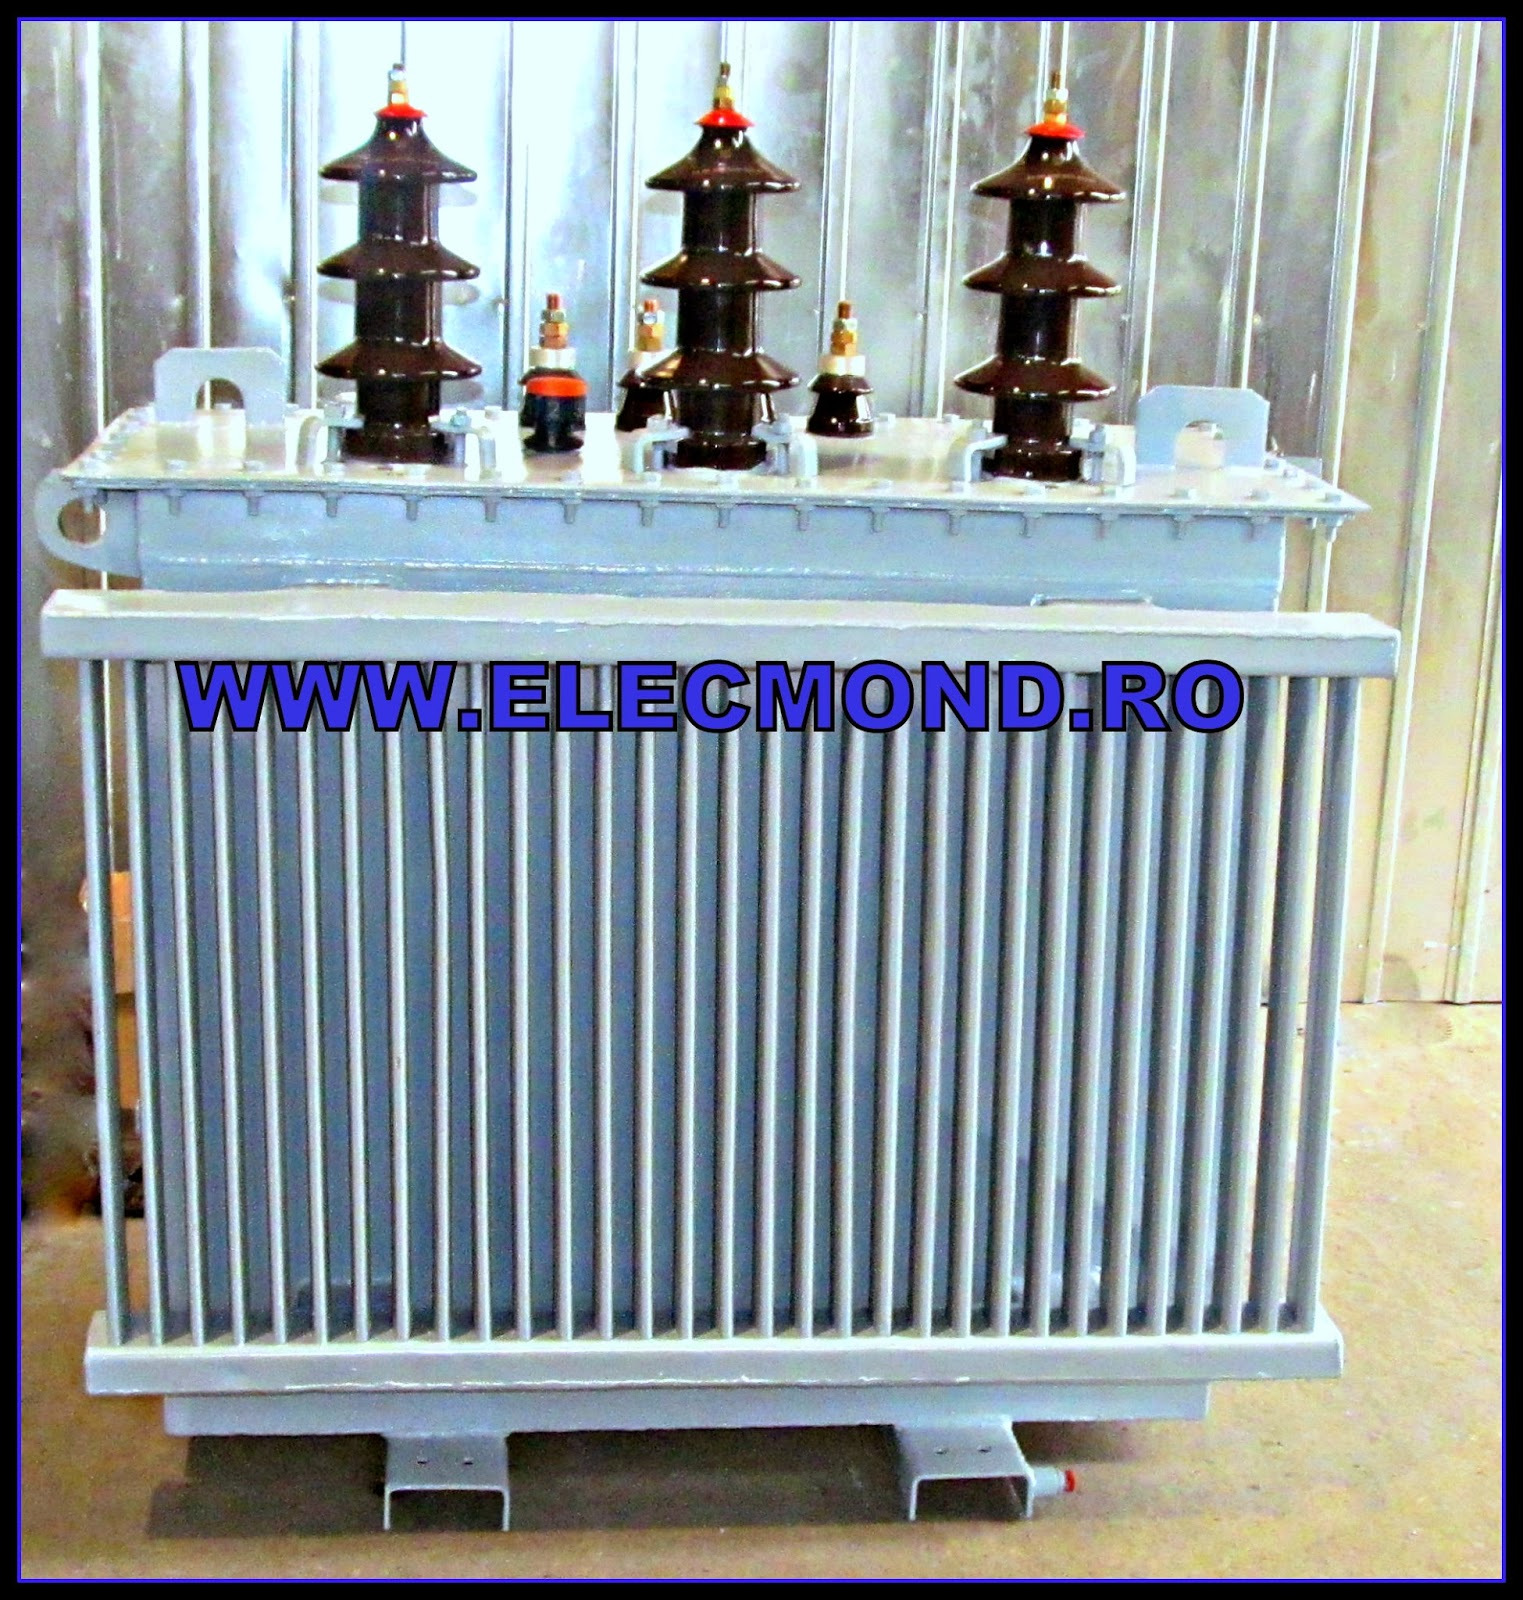 transformator 250 kVA,Oferta transformatoare ,, elecmond  , transformatoare electrice , transformator , preturi transformatoare , transformator de putere , 1000kVA, 1600kVA, 400kVA , 2000kVA, 630kVA